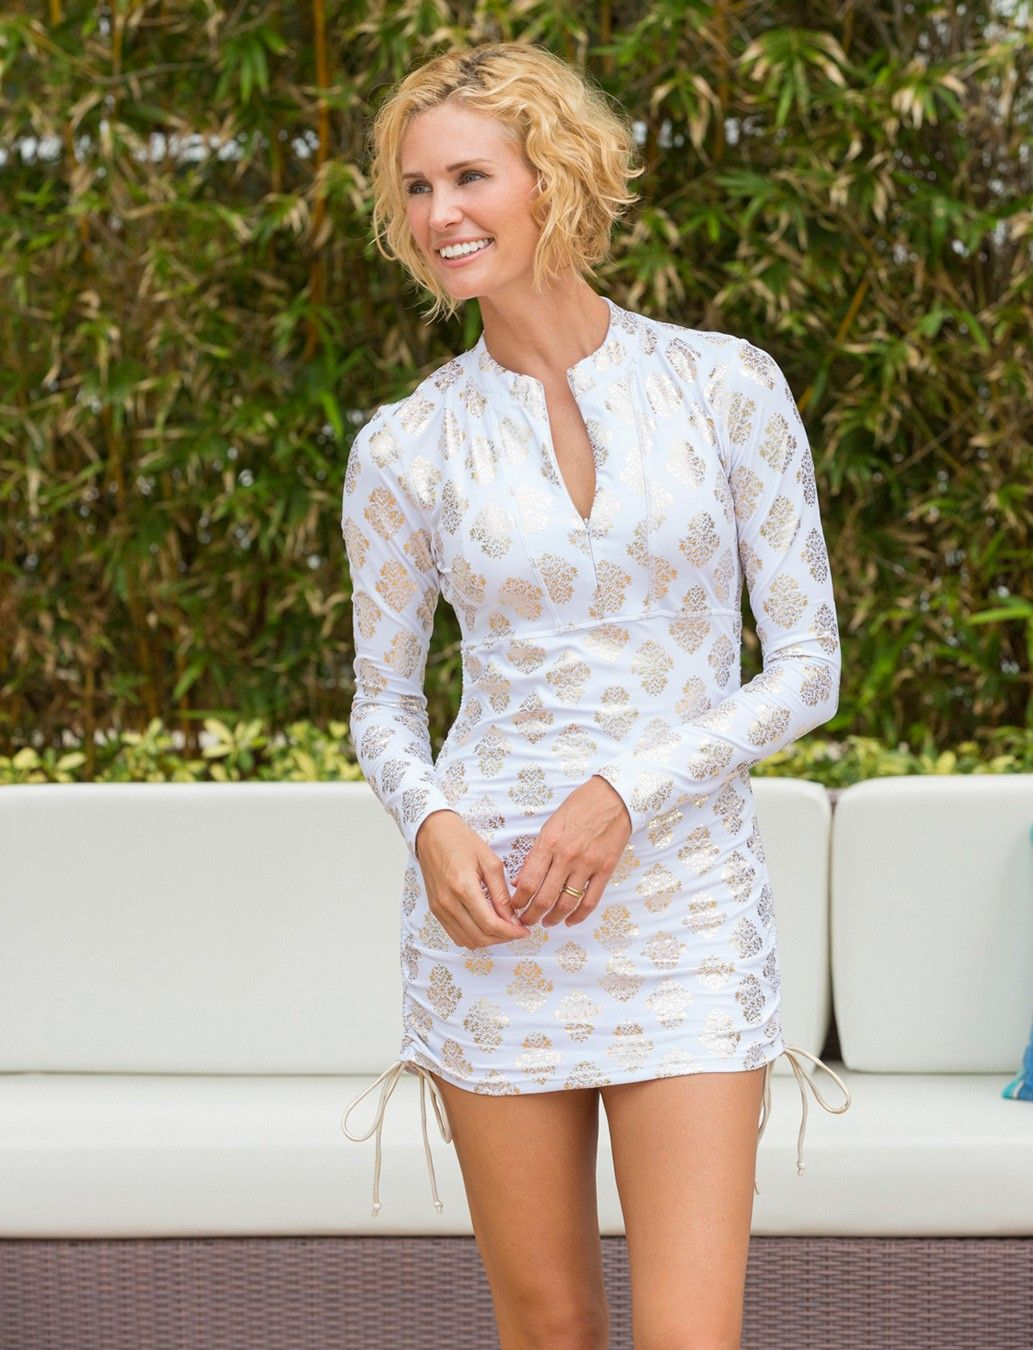 847ab4ac10 Cabana Life Womens White and Gold Printed Ruched Rashguard Dress - 50+ UV  Protection